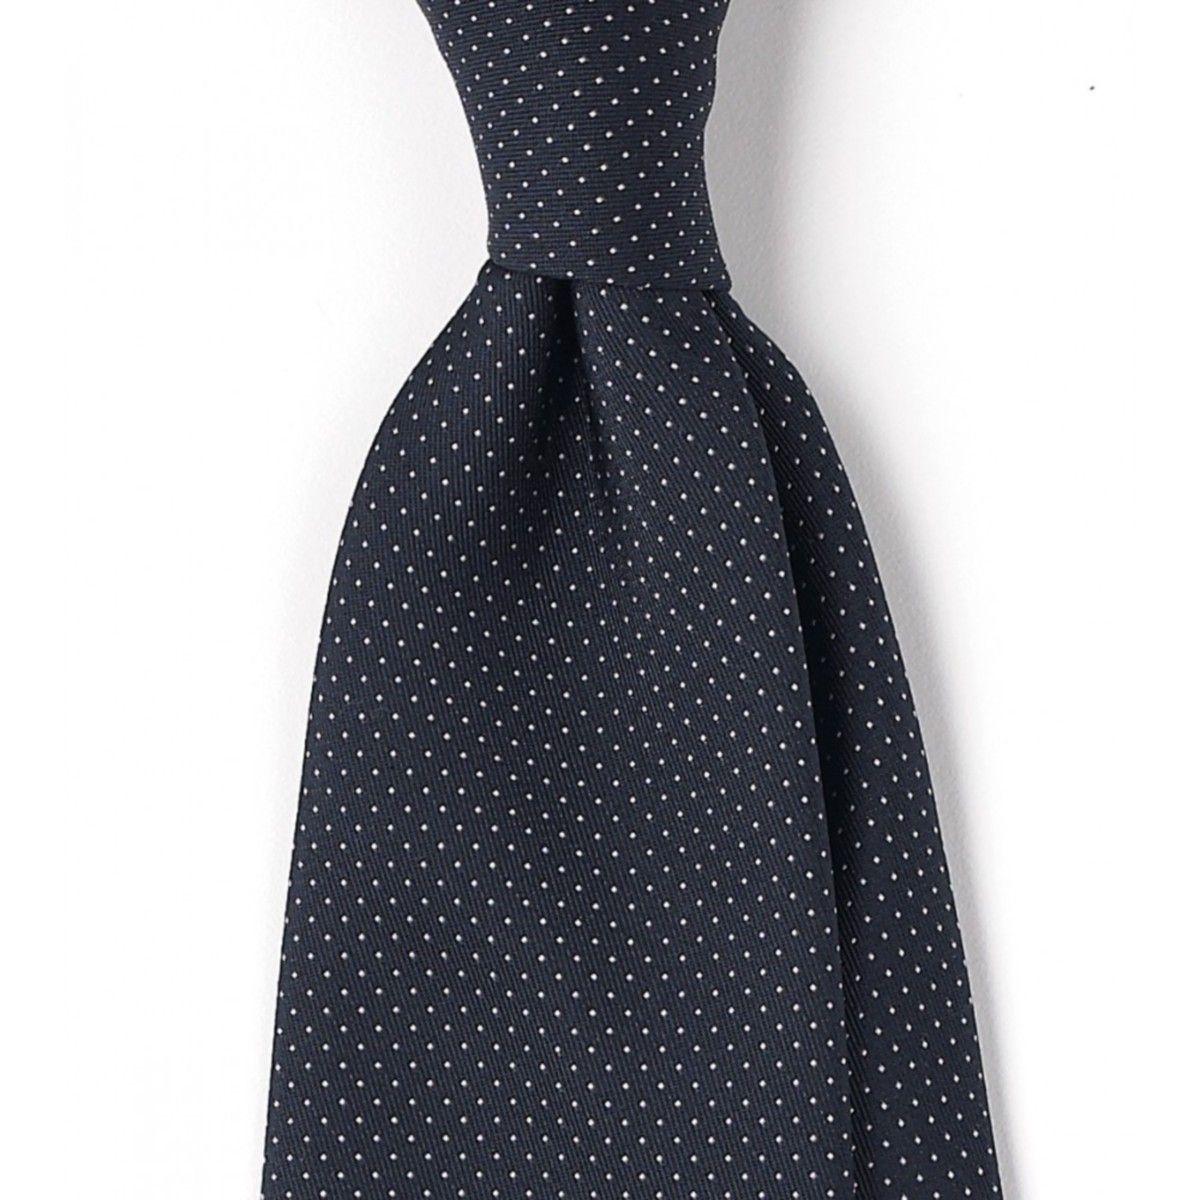 Cravate Bleu Marine À Motifs De Drake hk4b9Yv88